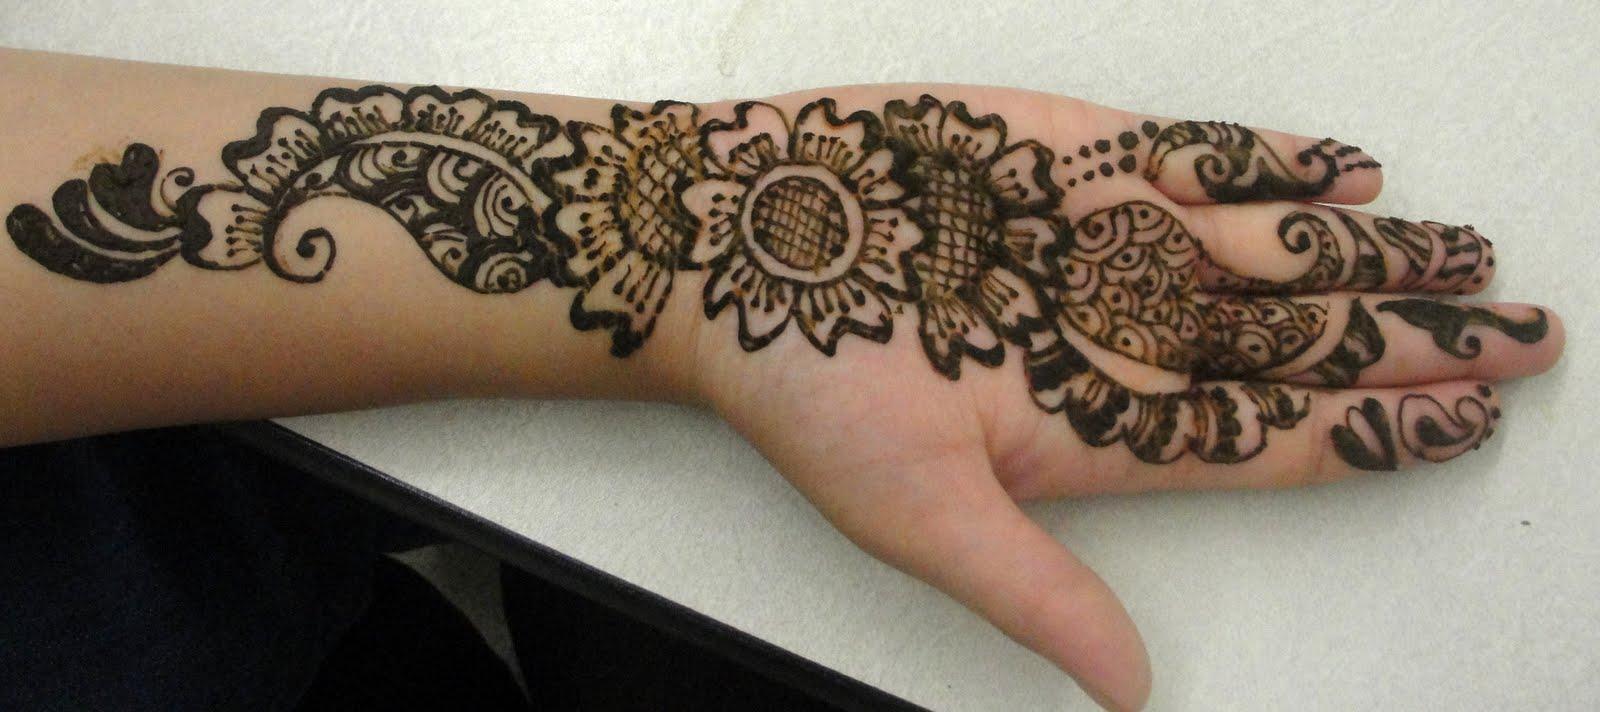 Flower Mehndi Designs Images : Red impression floral arabic mehndi henna design